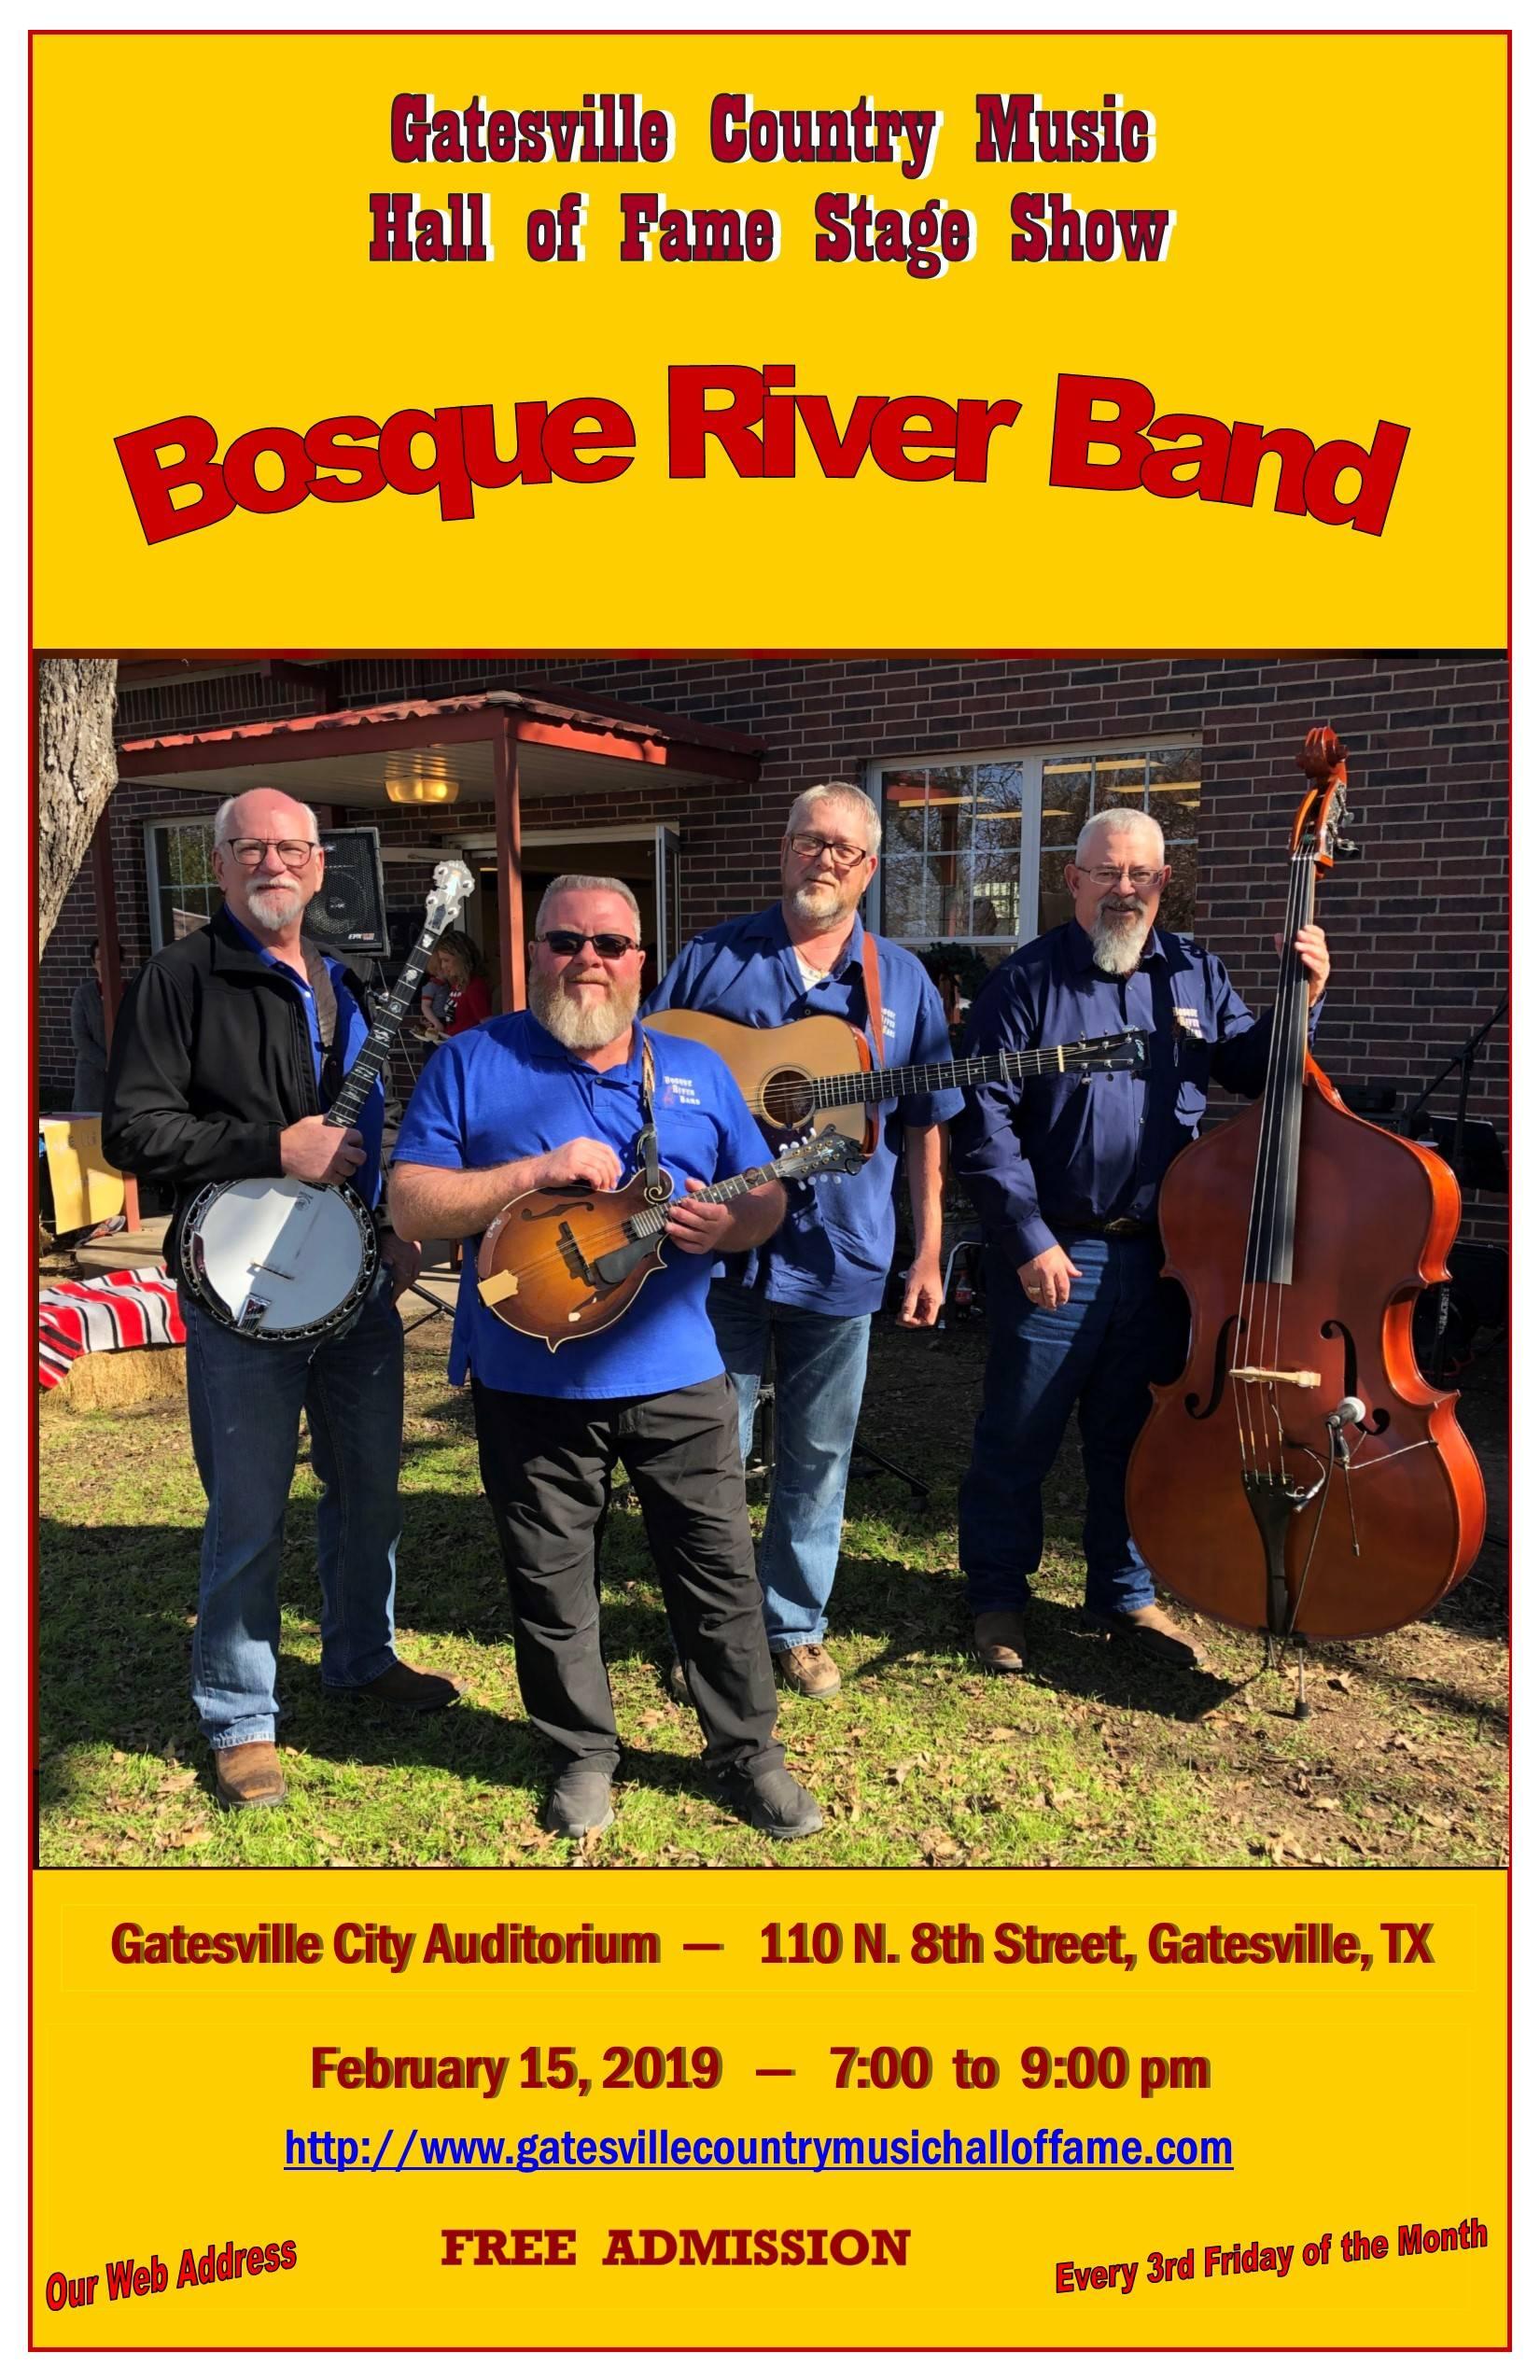 Bosque River Band, February 15, 2019